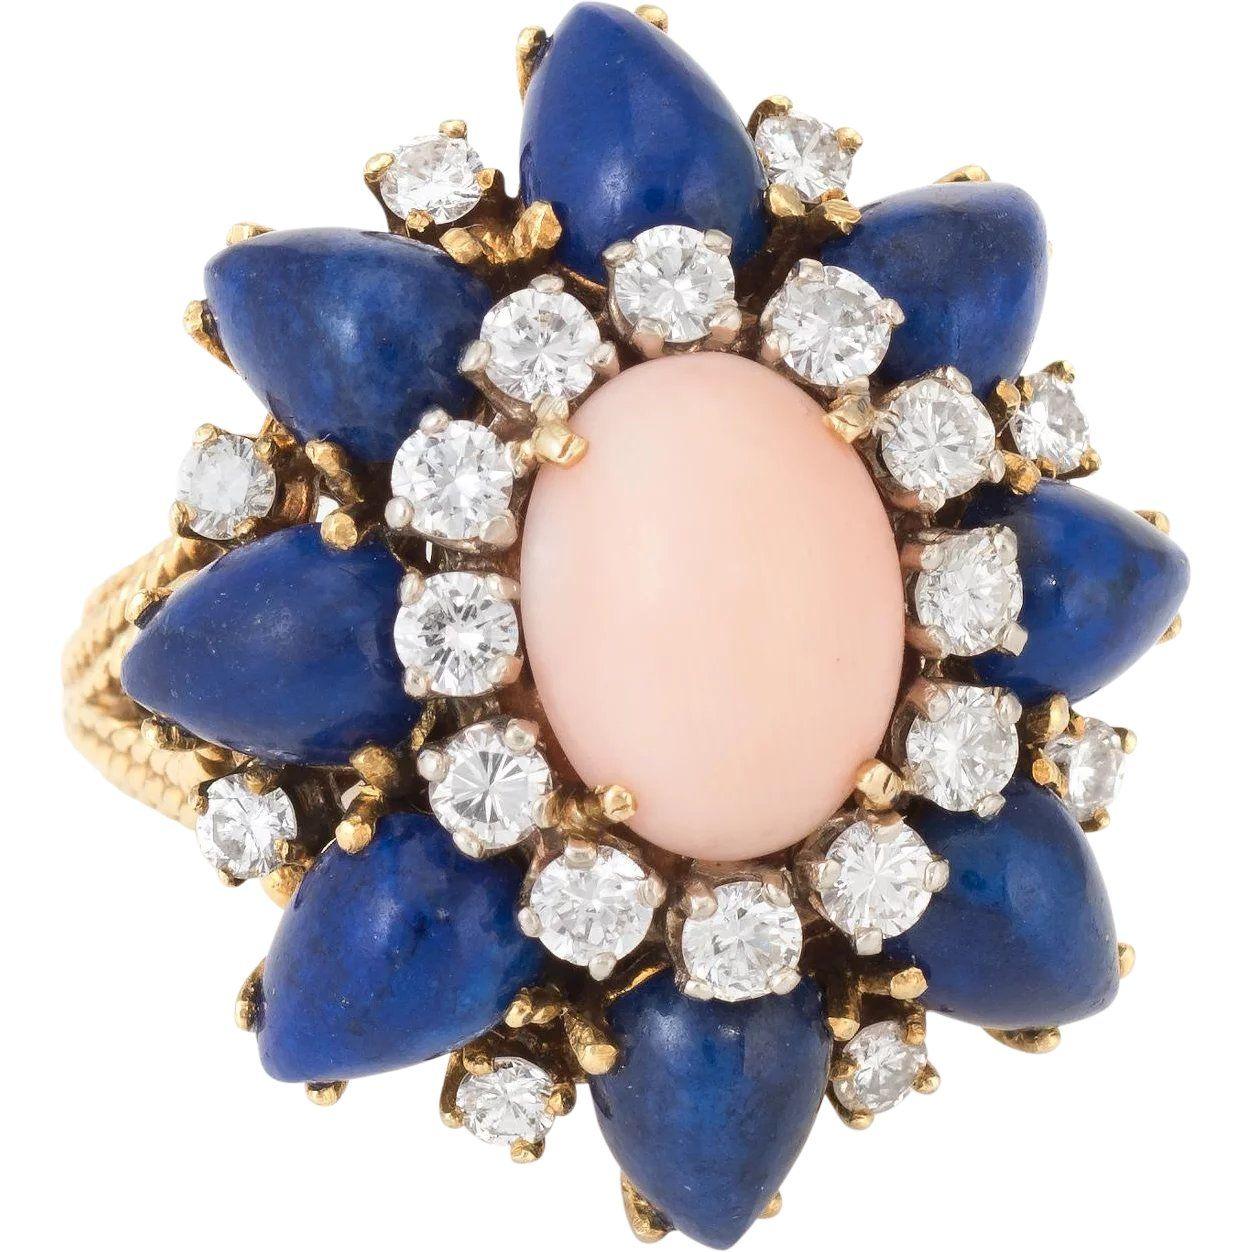 a2525404914 1960s Coral Lapis Diamond Cocktail Ring Vintage 14 Karat Yellow Gold Estate  Jewelry #rings #vintage #vintagebeginshere